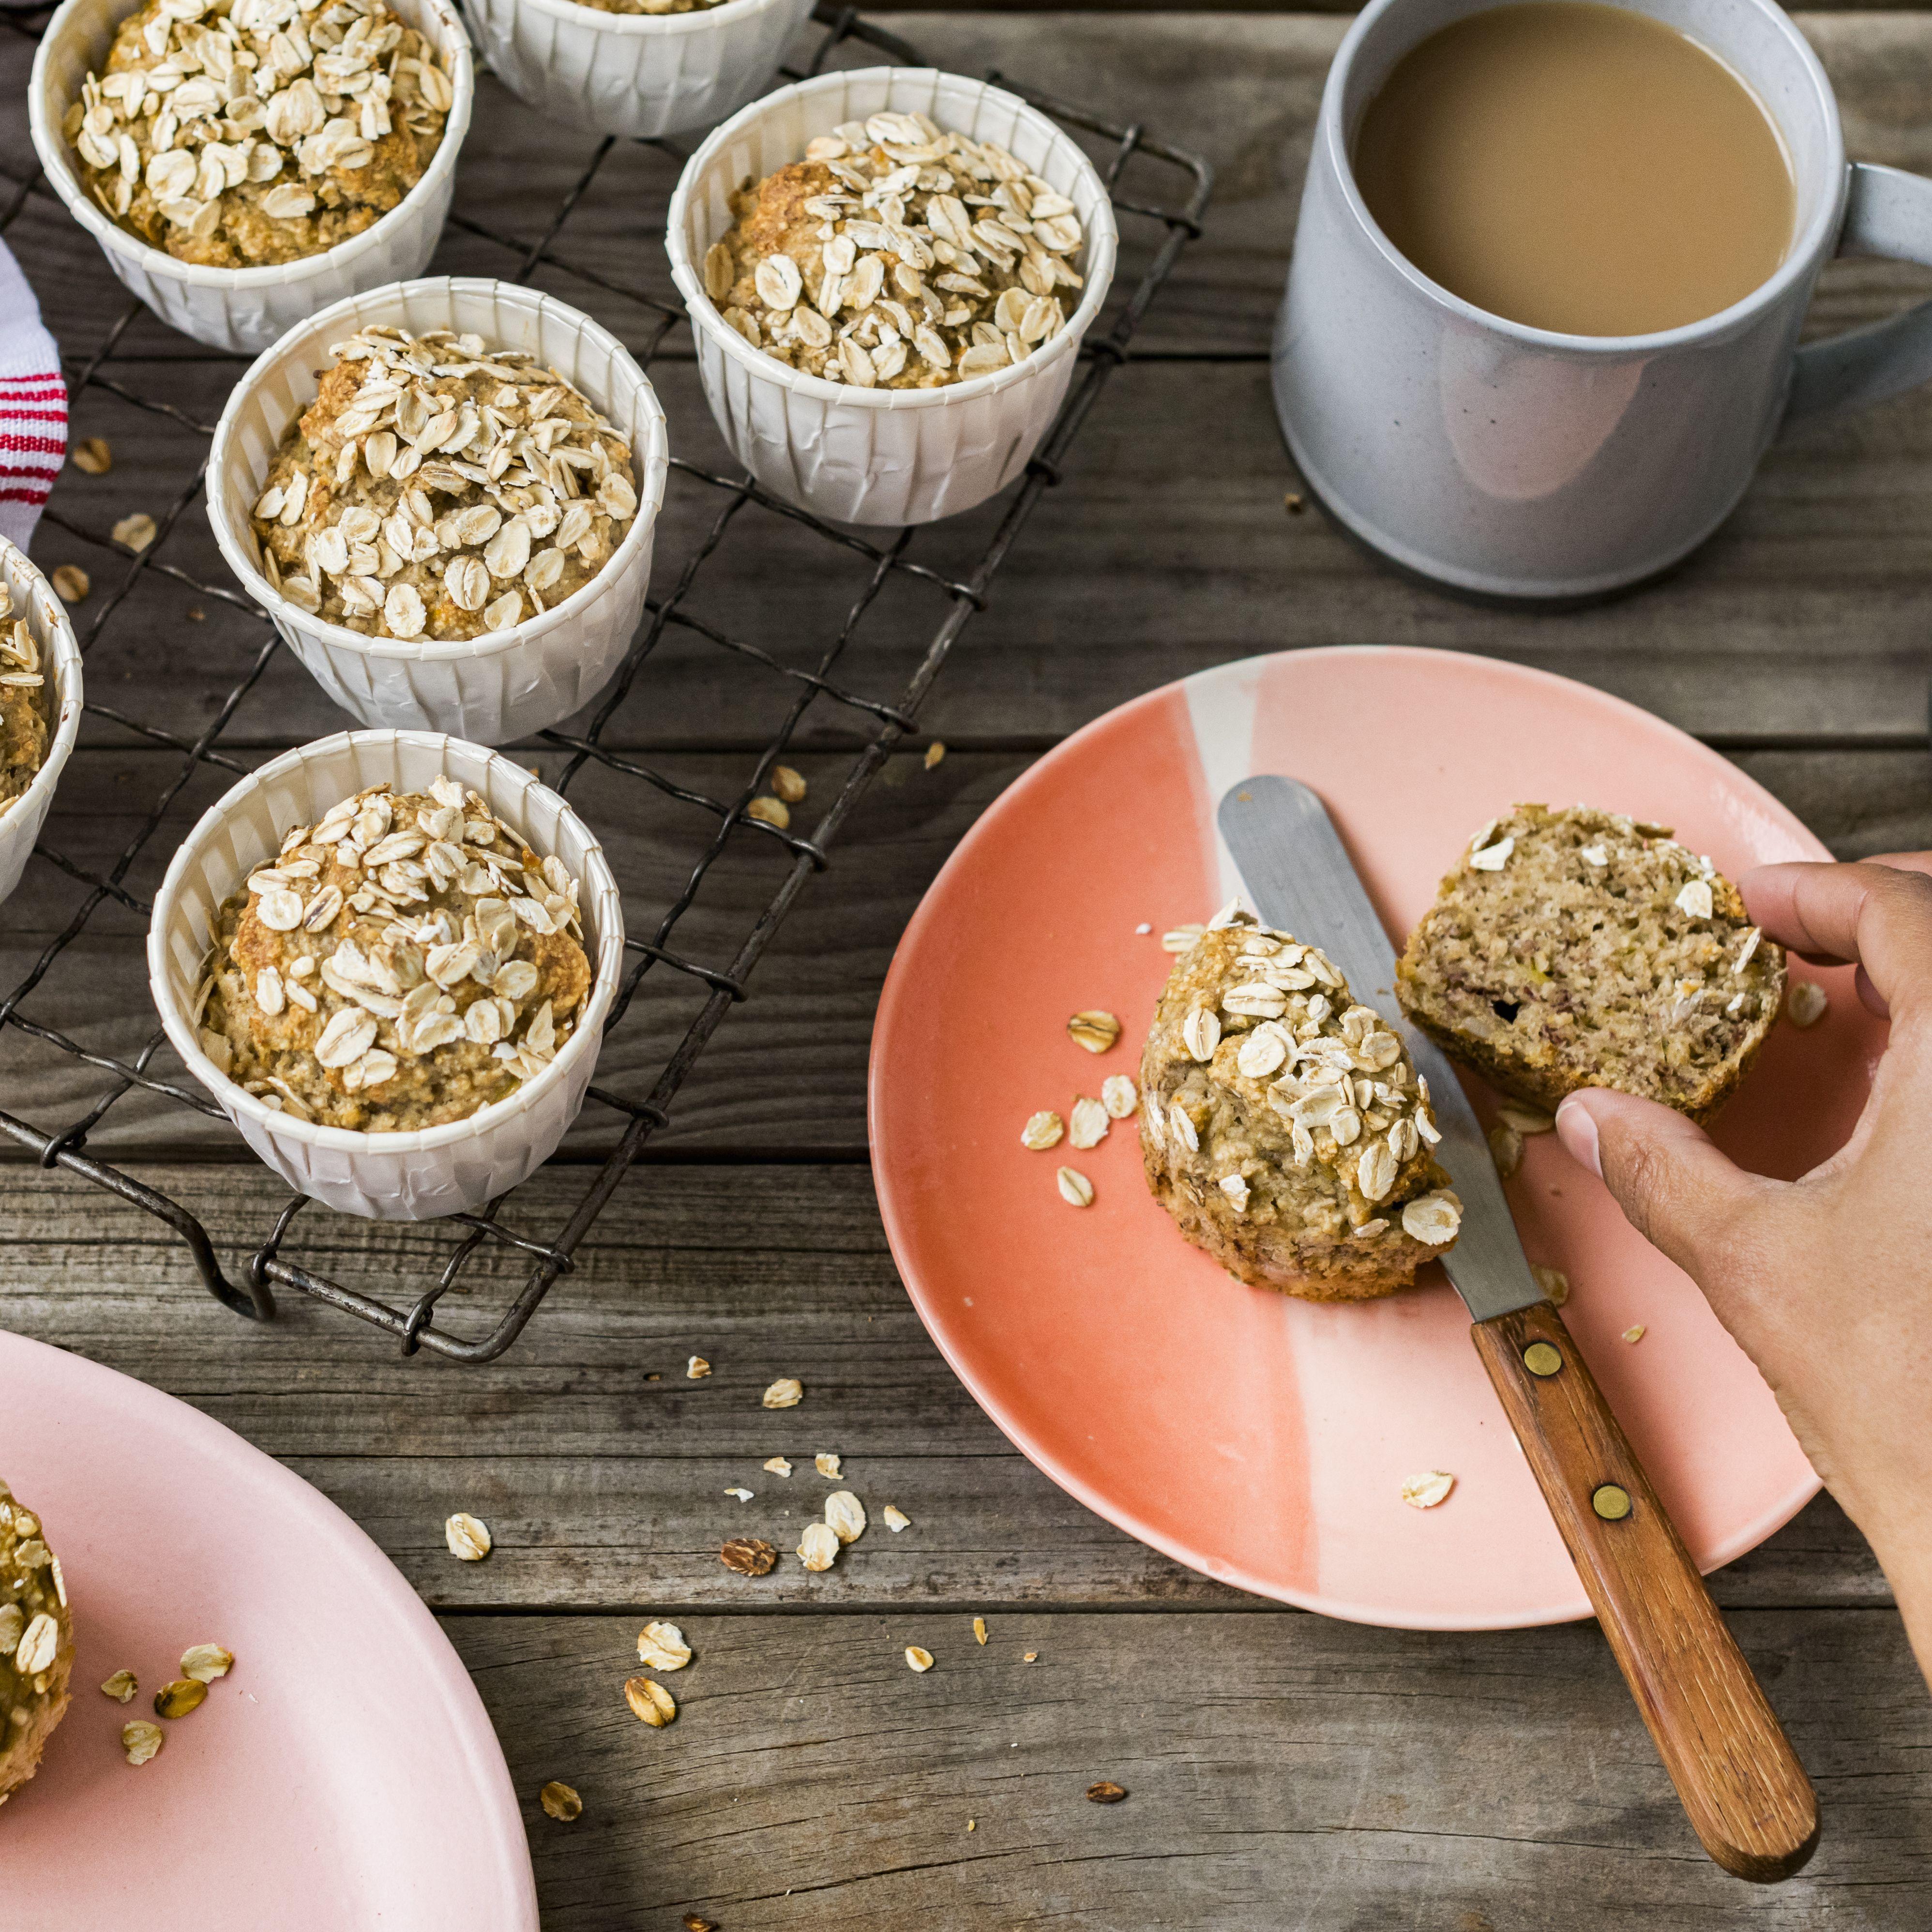 are quaker oats gluten free uk